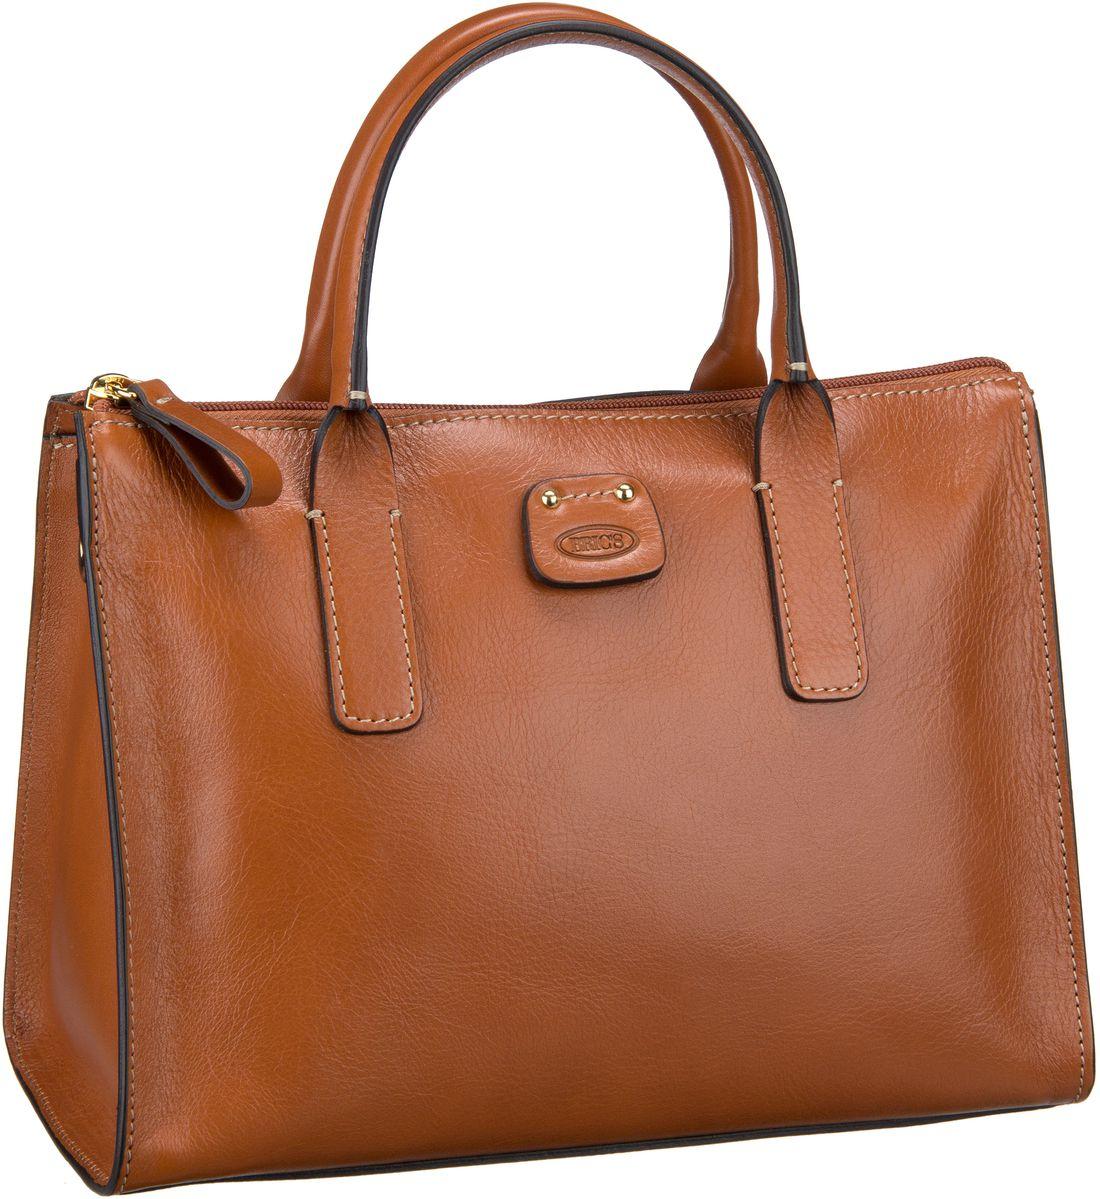 's Handtasche Life Pelle Damentasche 3299 Cuoio